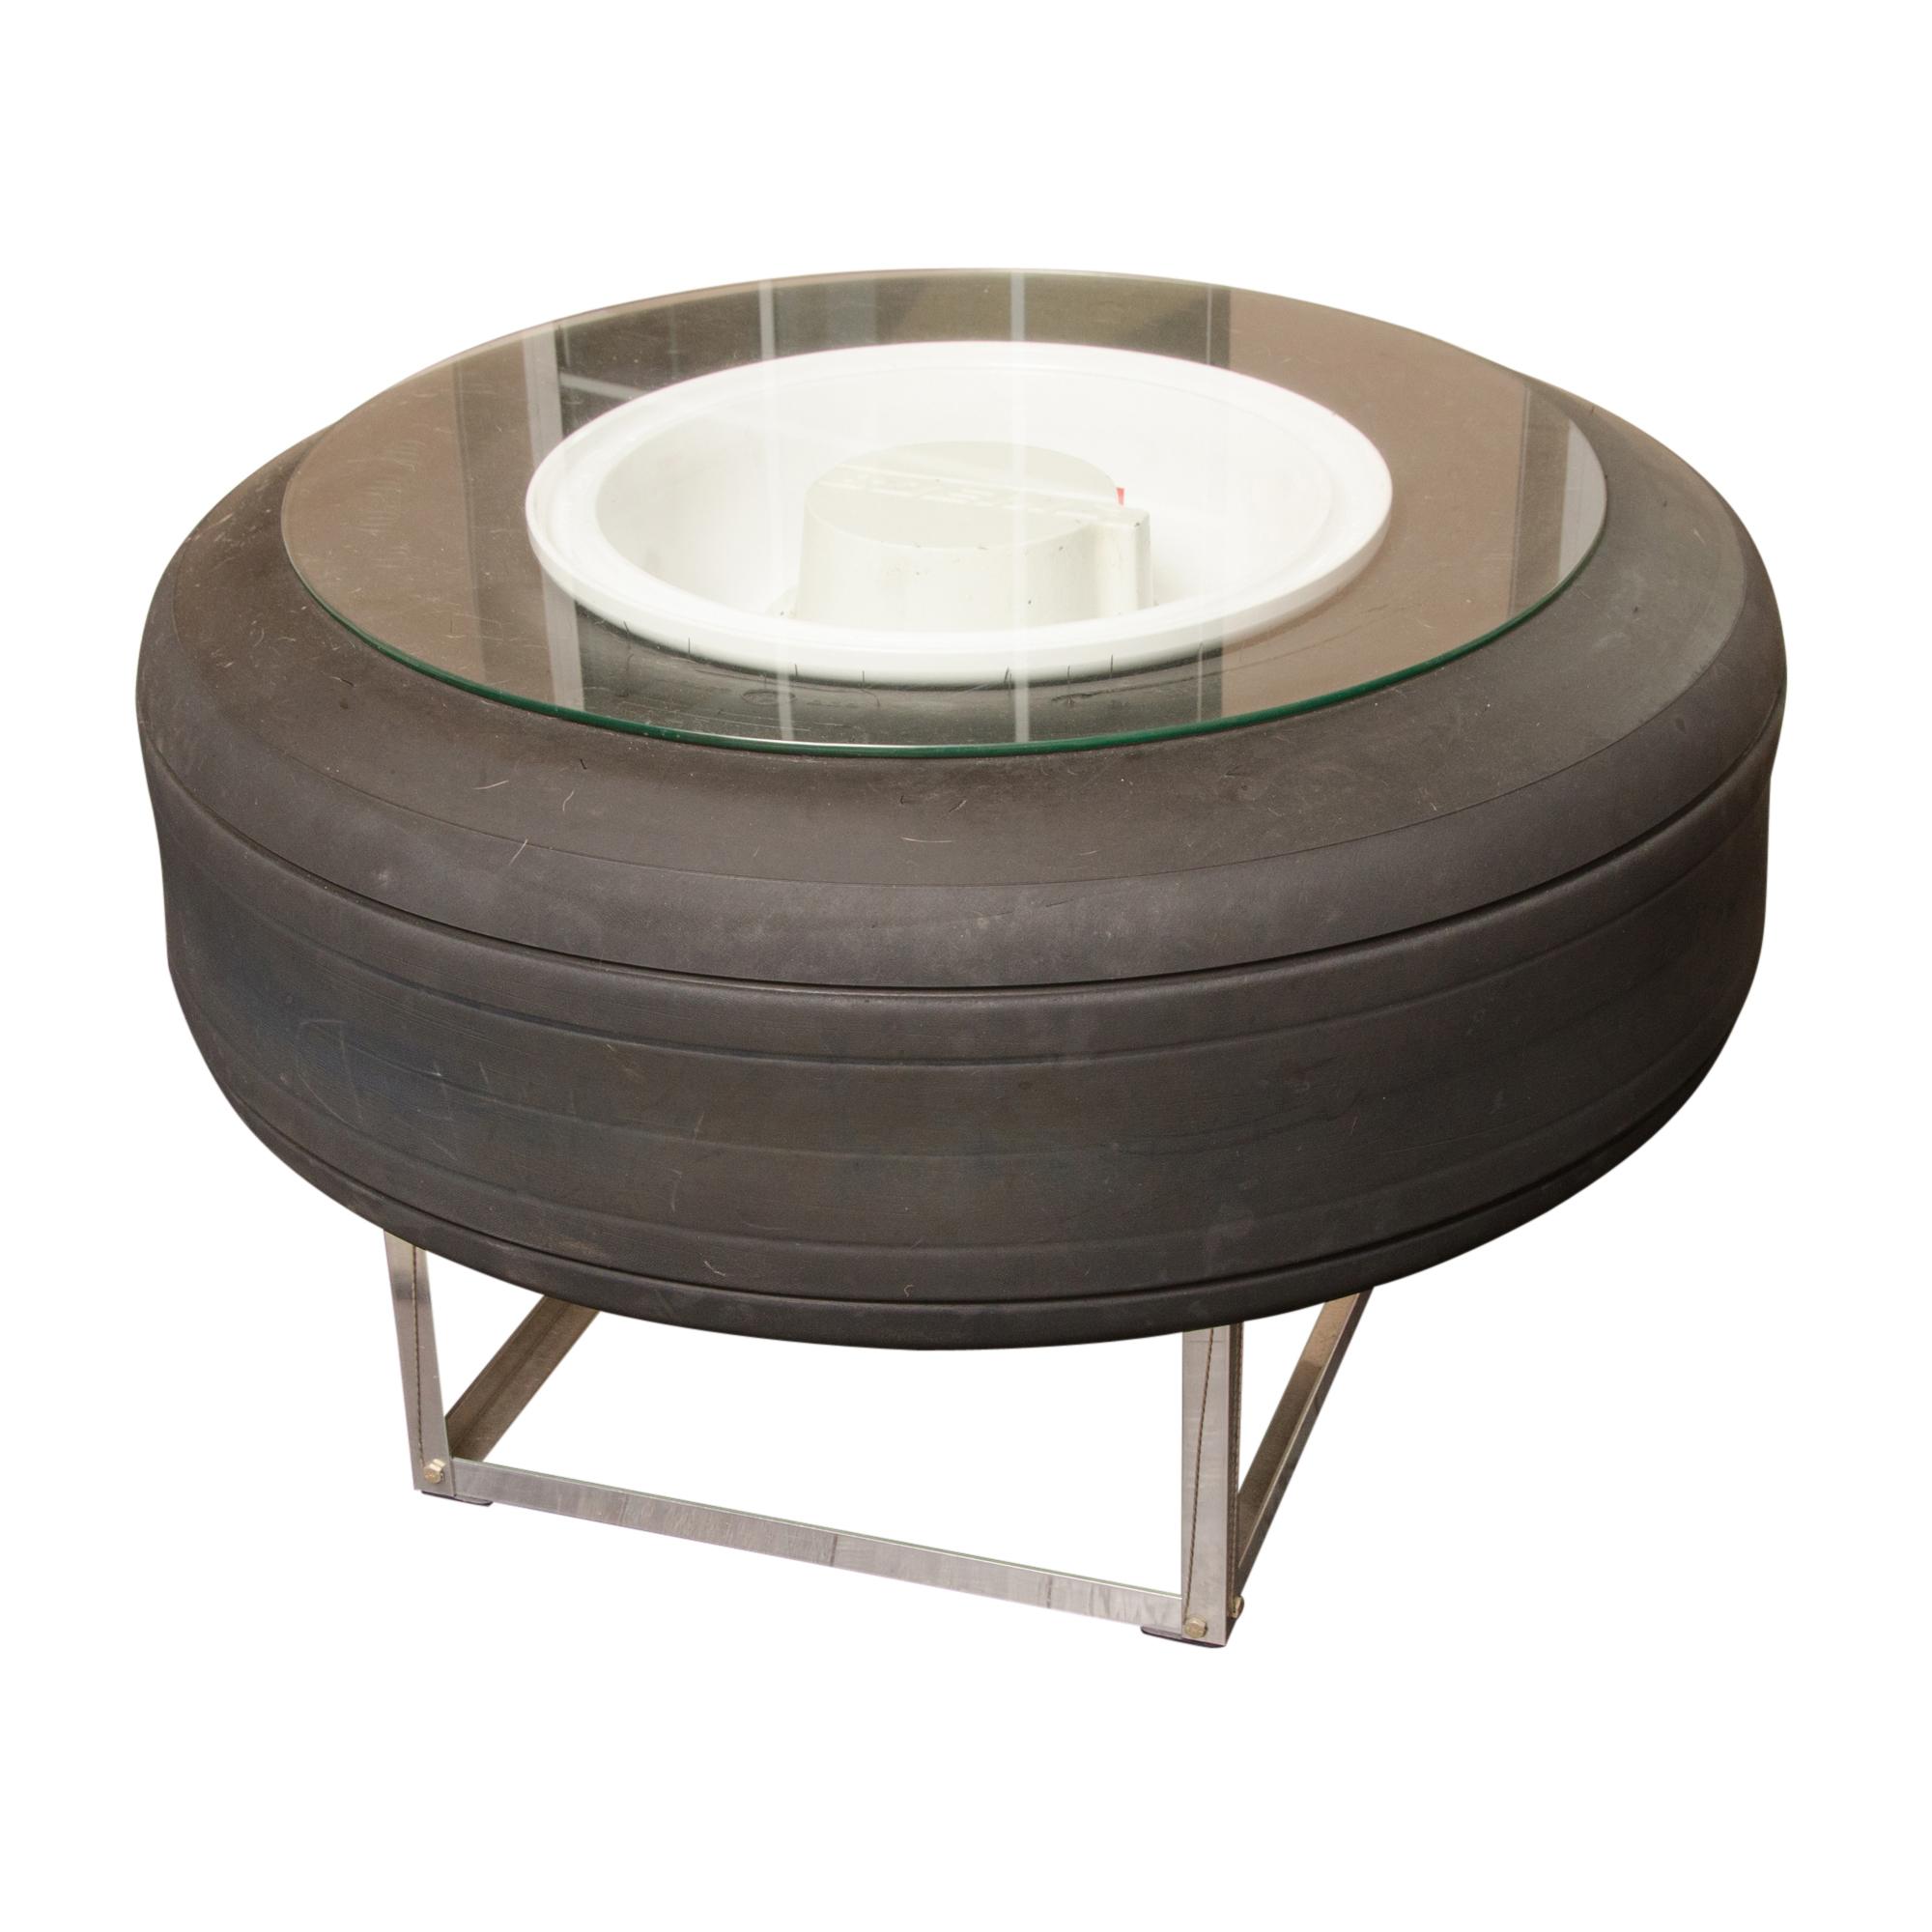 Repurposed Boeing Airplane Tire Coffee Table EBTH